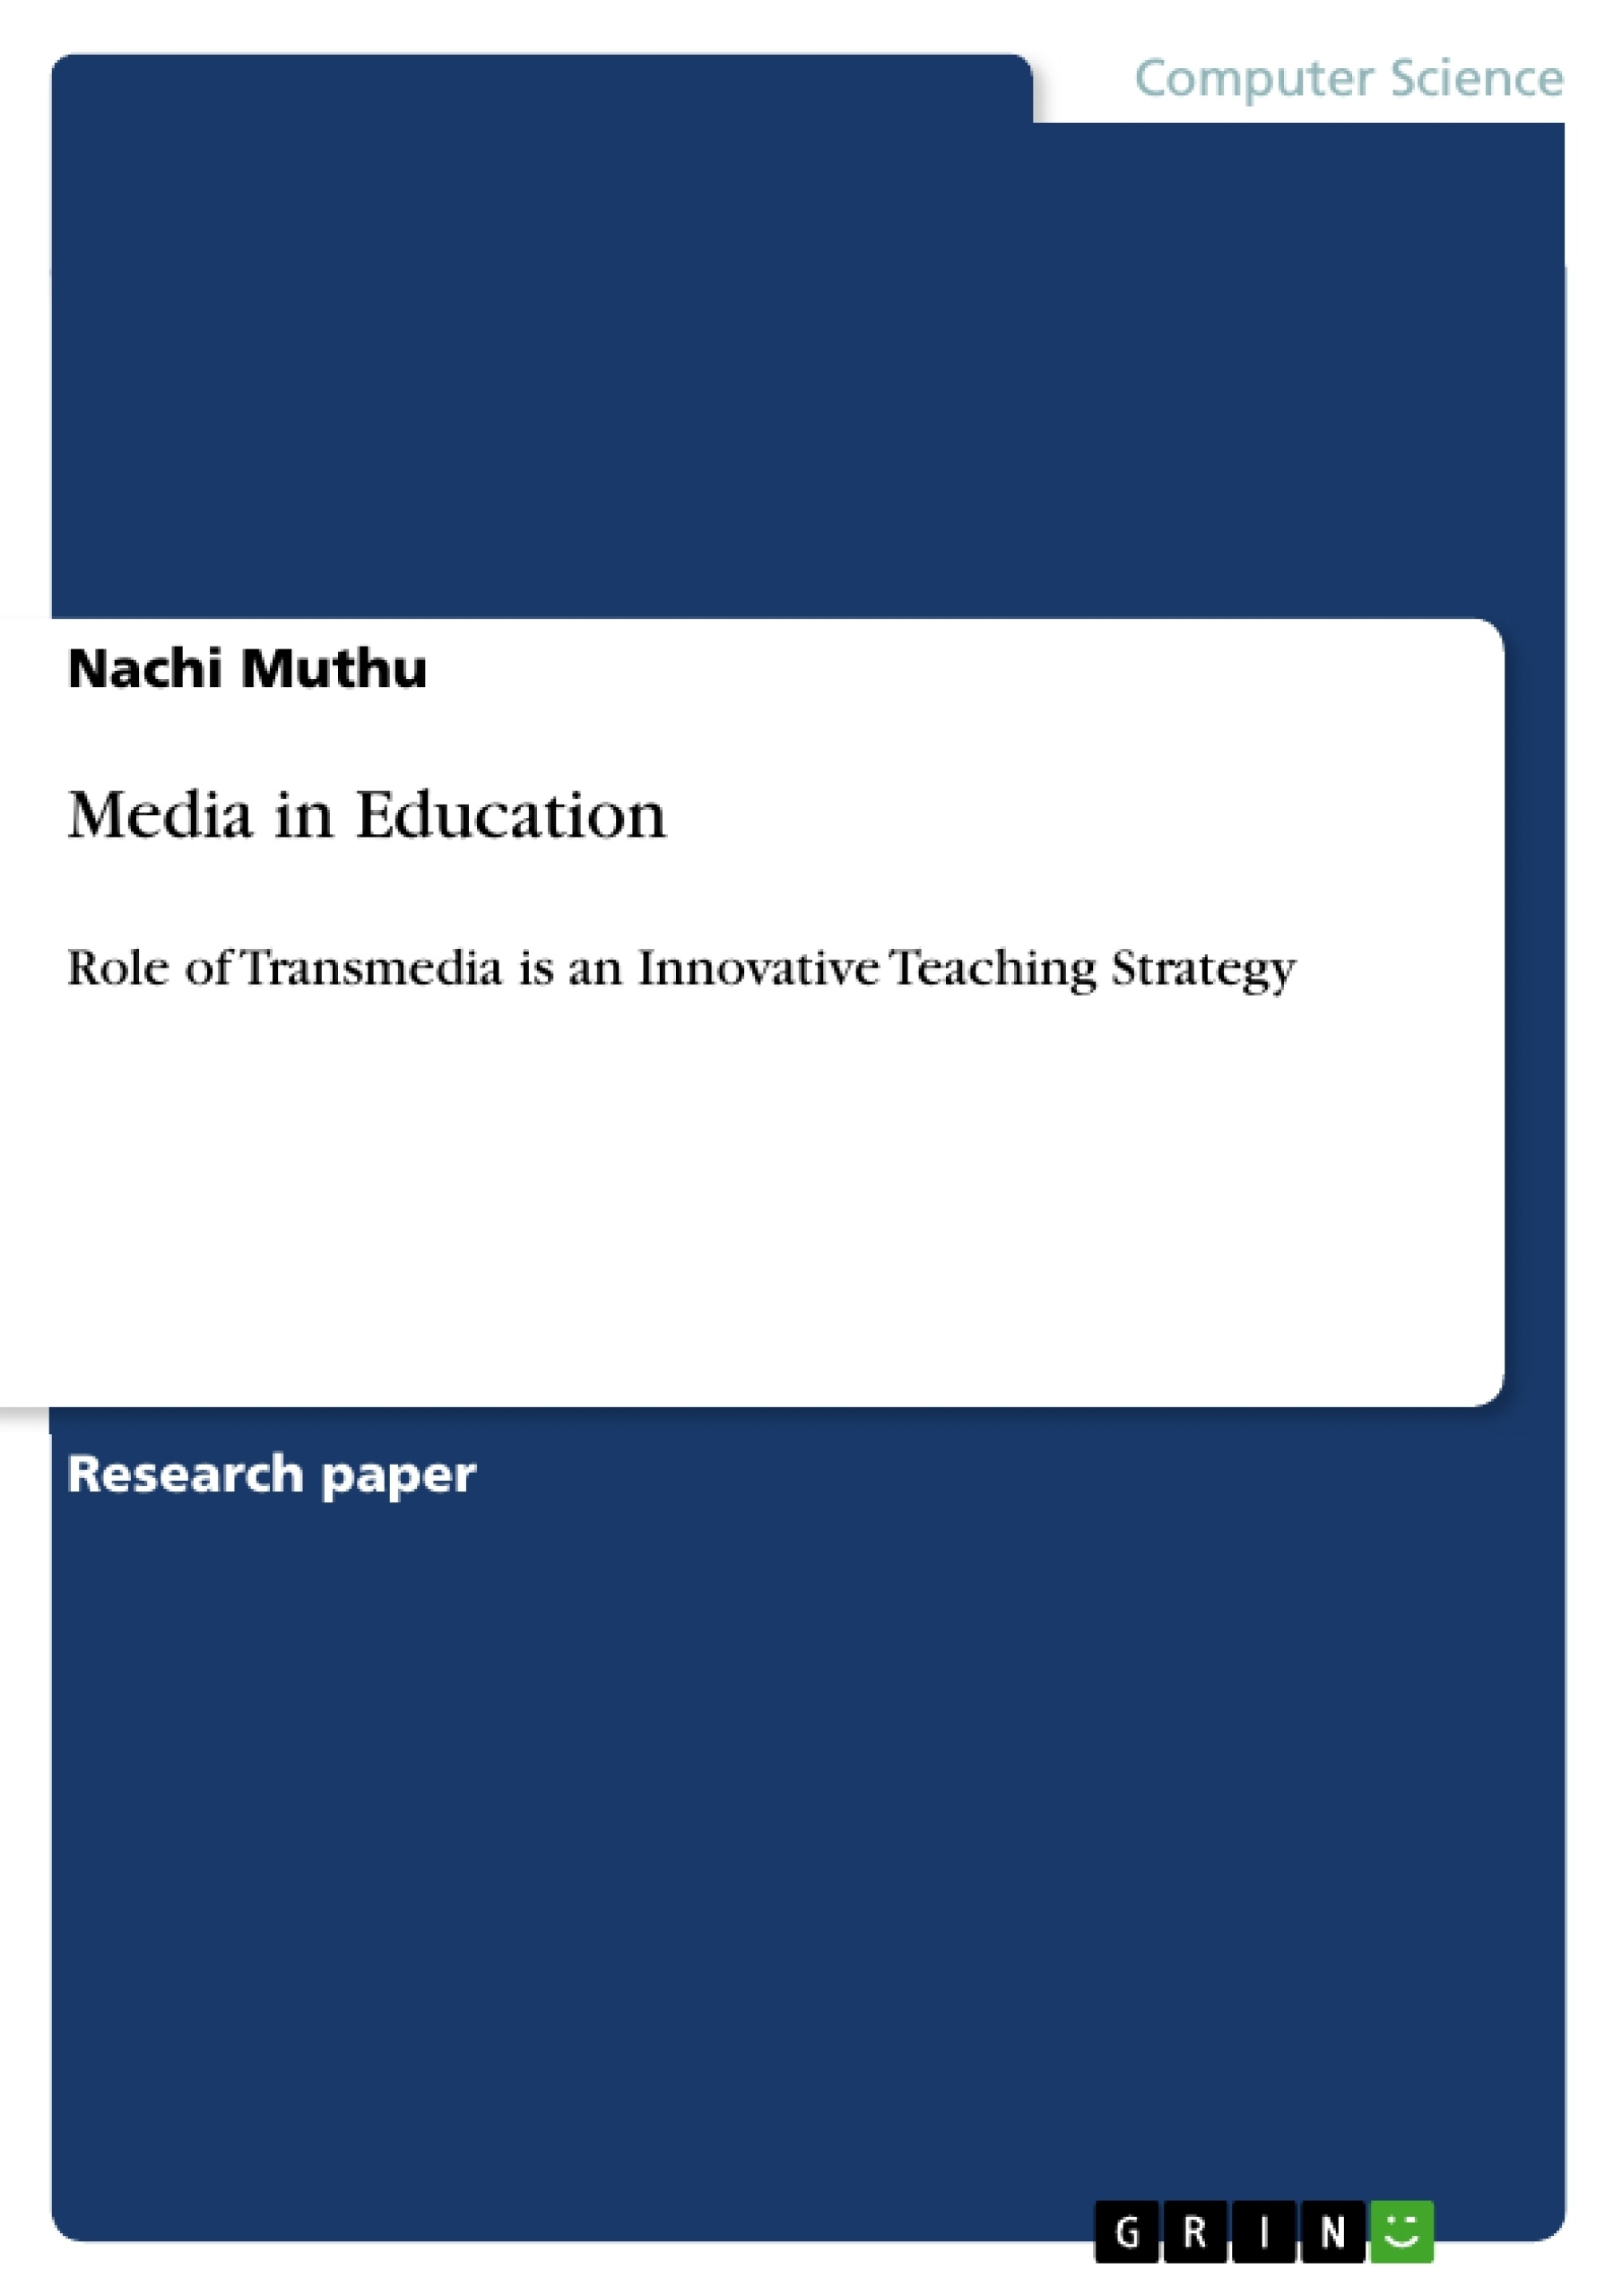 Title: Media in Education